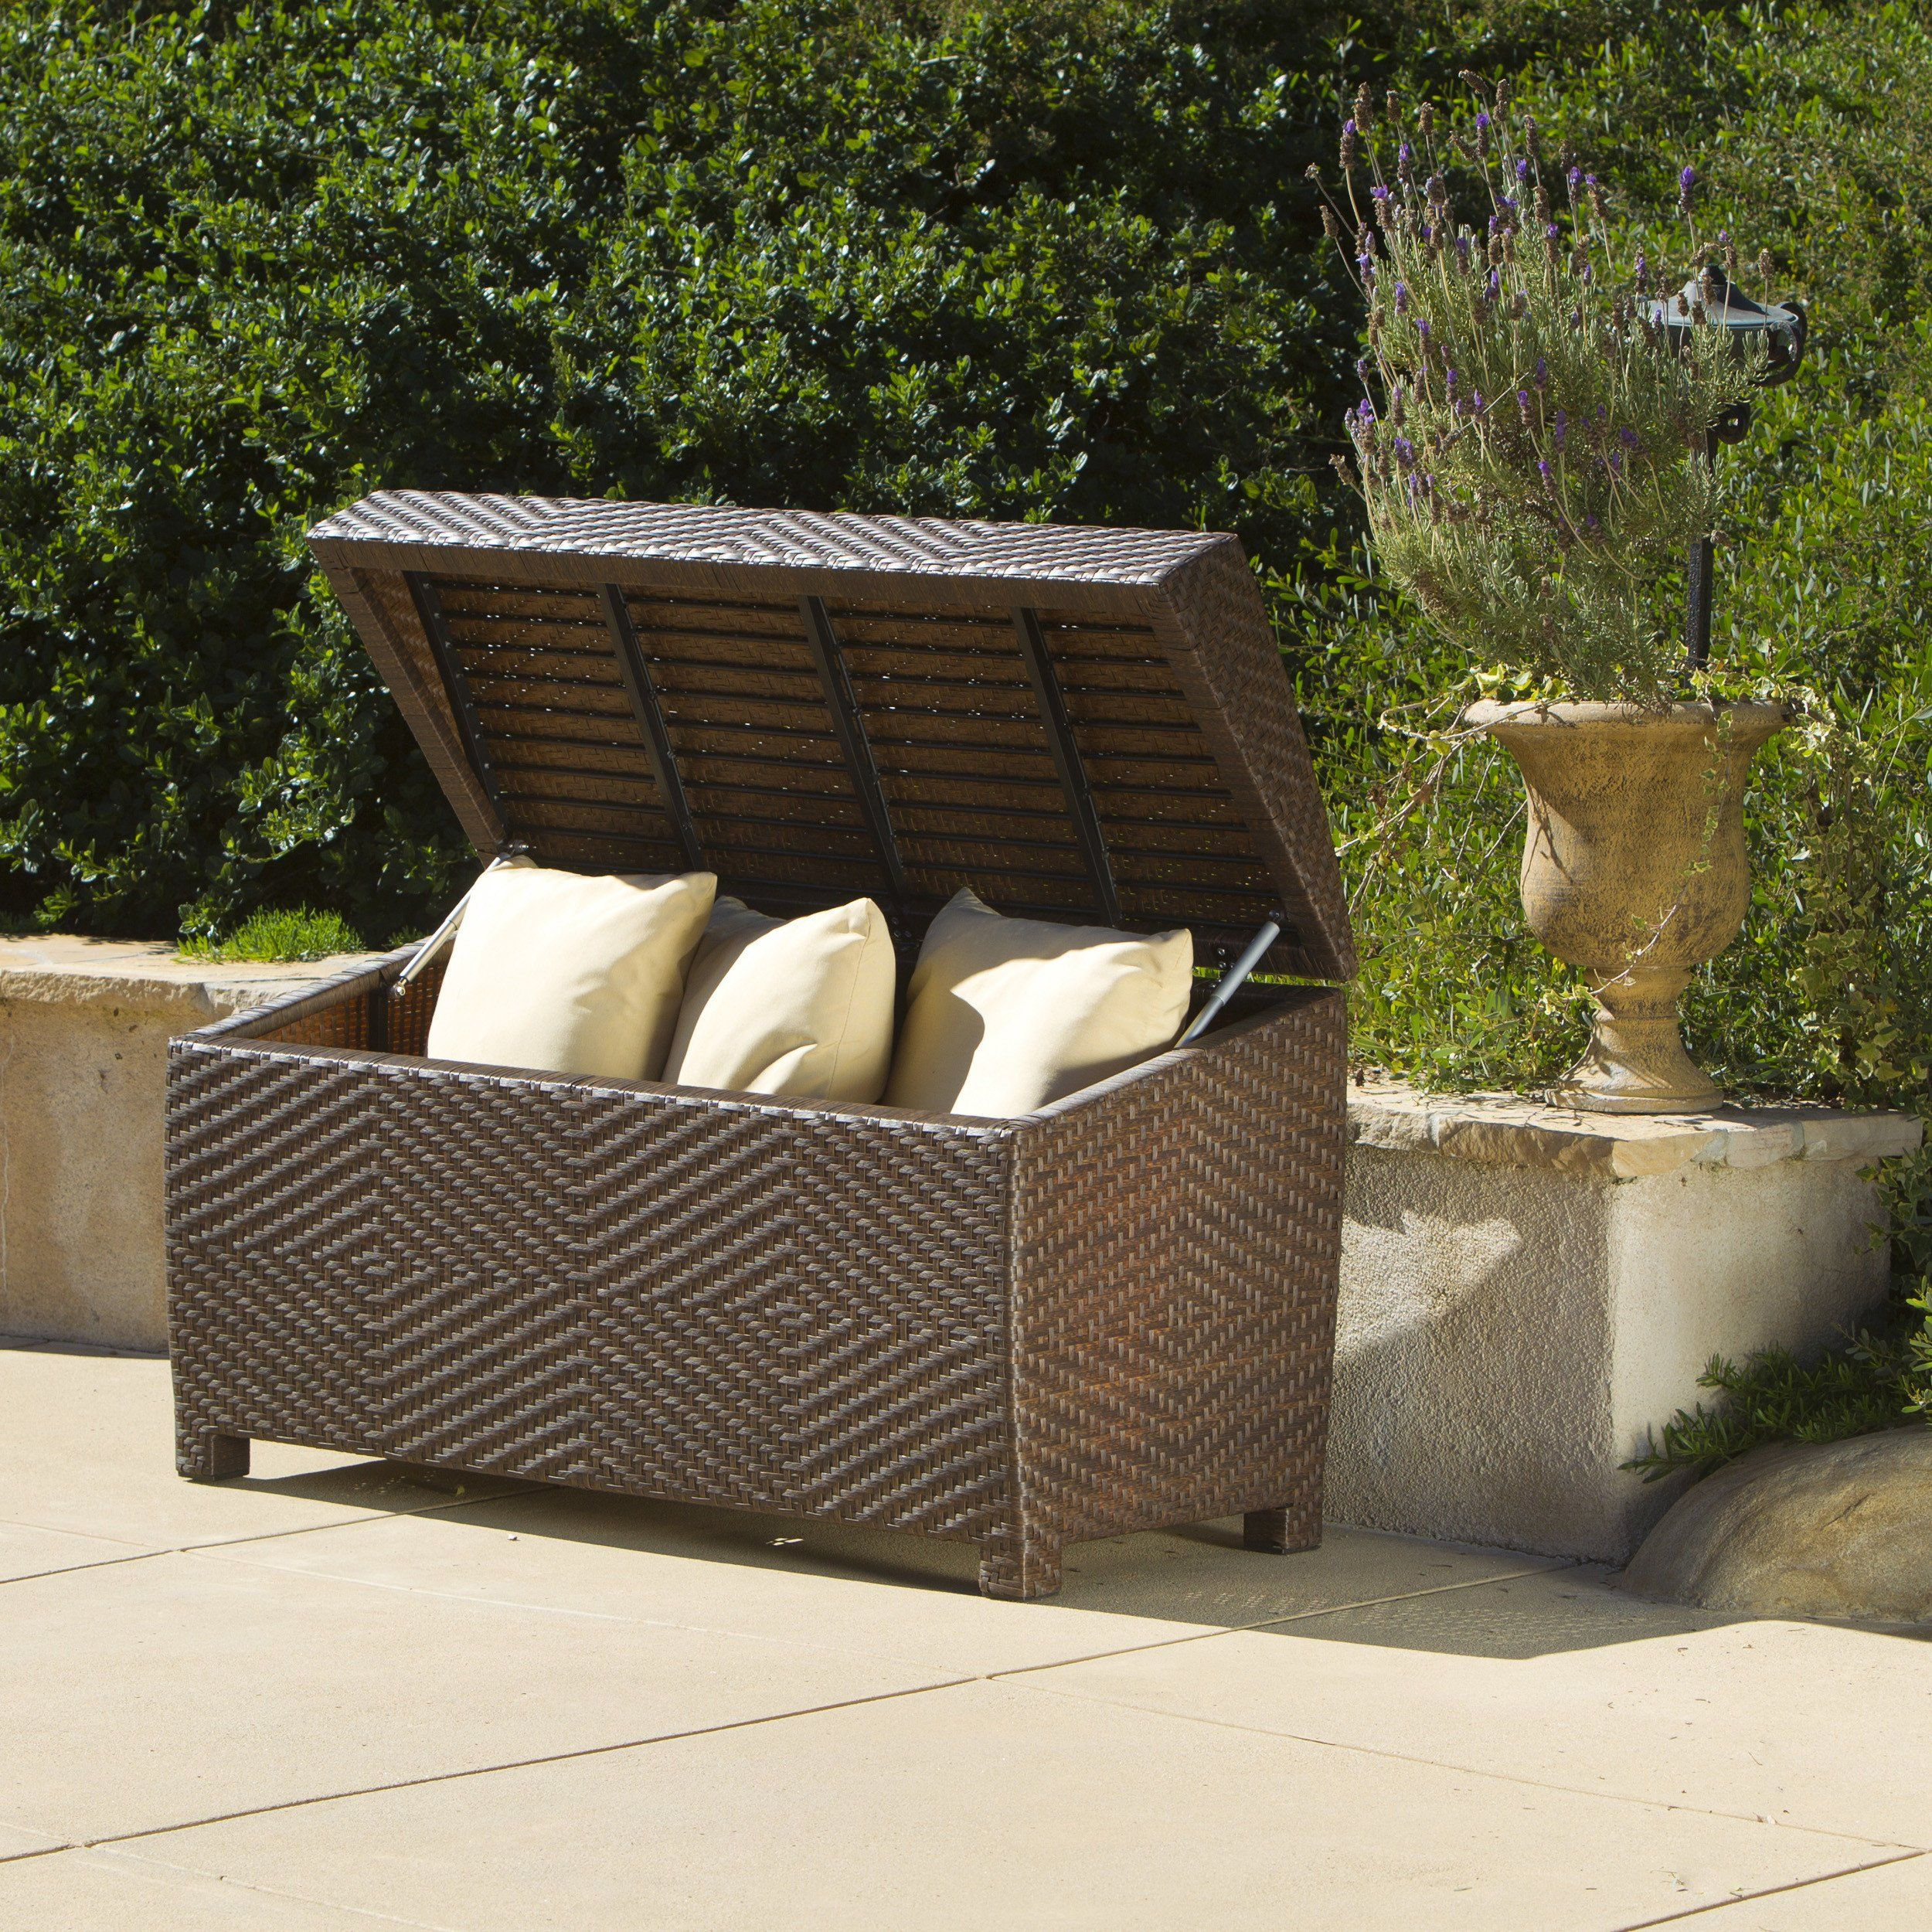 Deck Storage Box Waterproof Patio Furniture Storage Ottoman Bin Poolside Storing Learn Mor Outdoor Patio Chair Cushions Patio Storage Wicker Patio Furniture